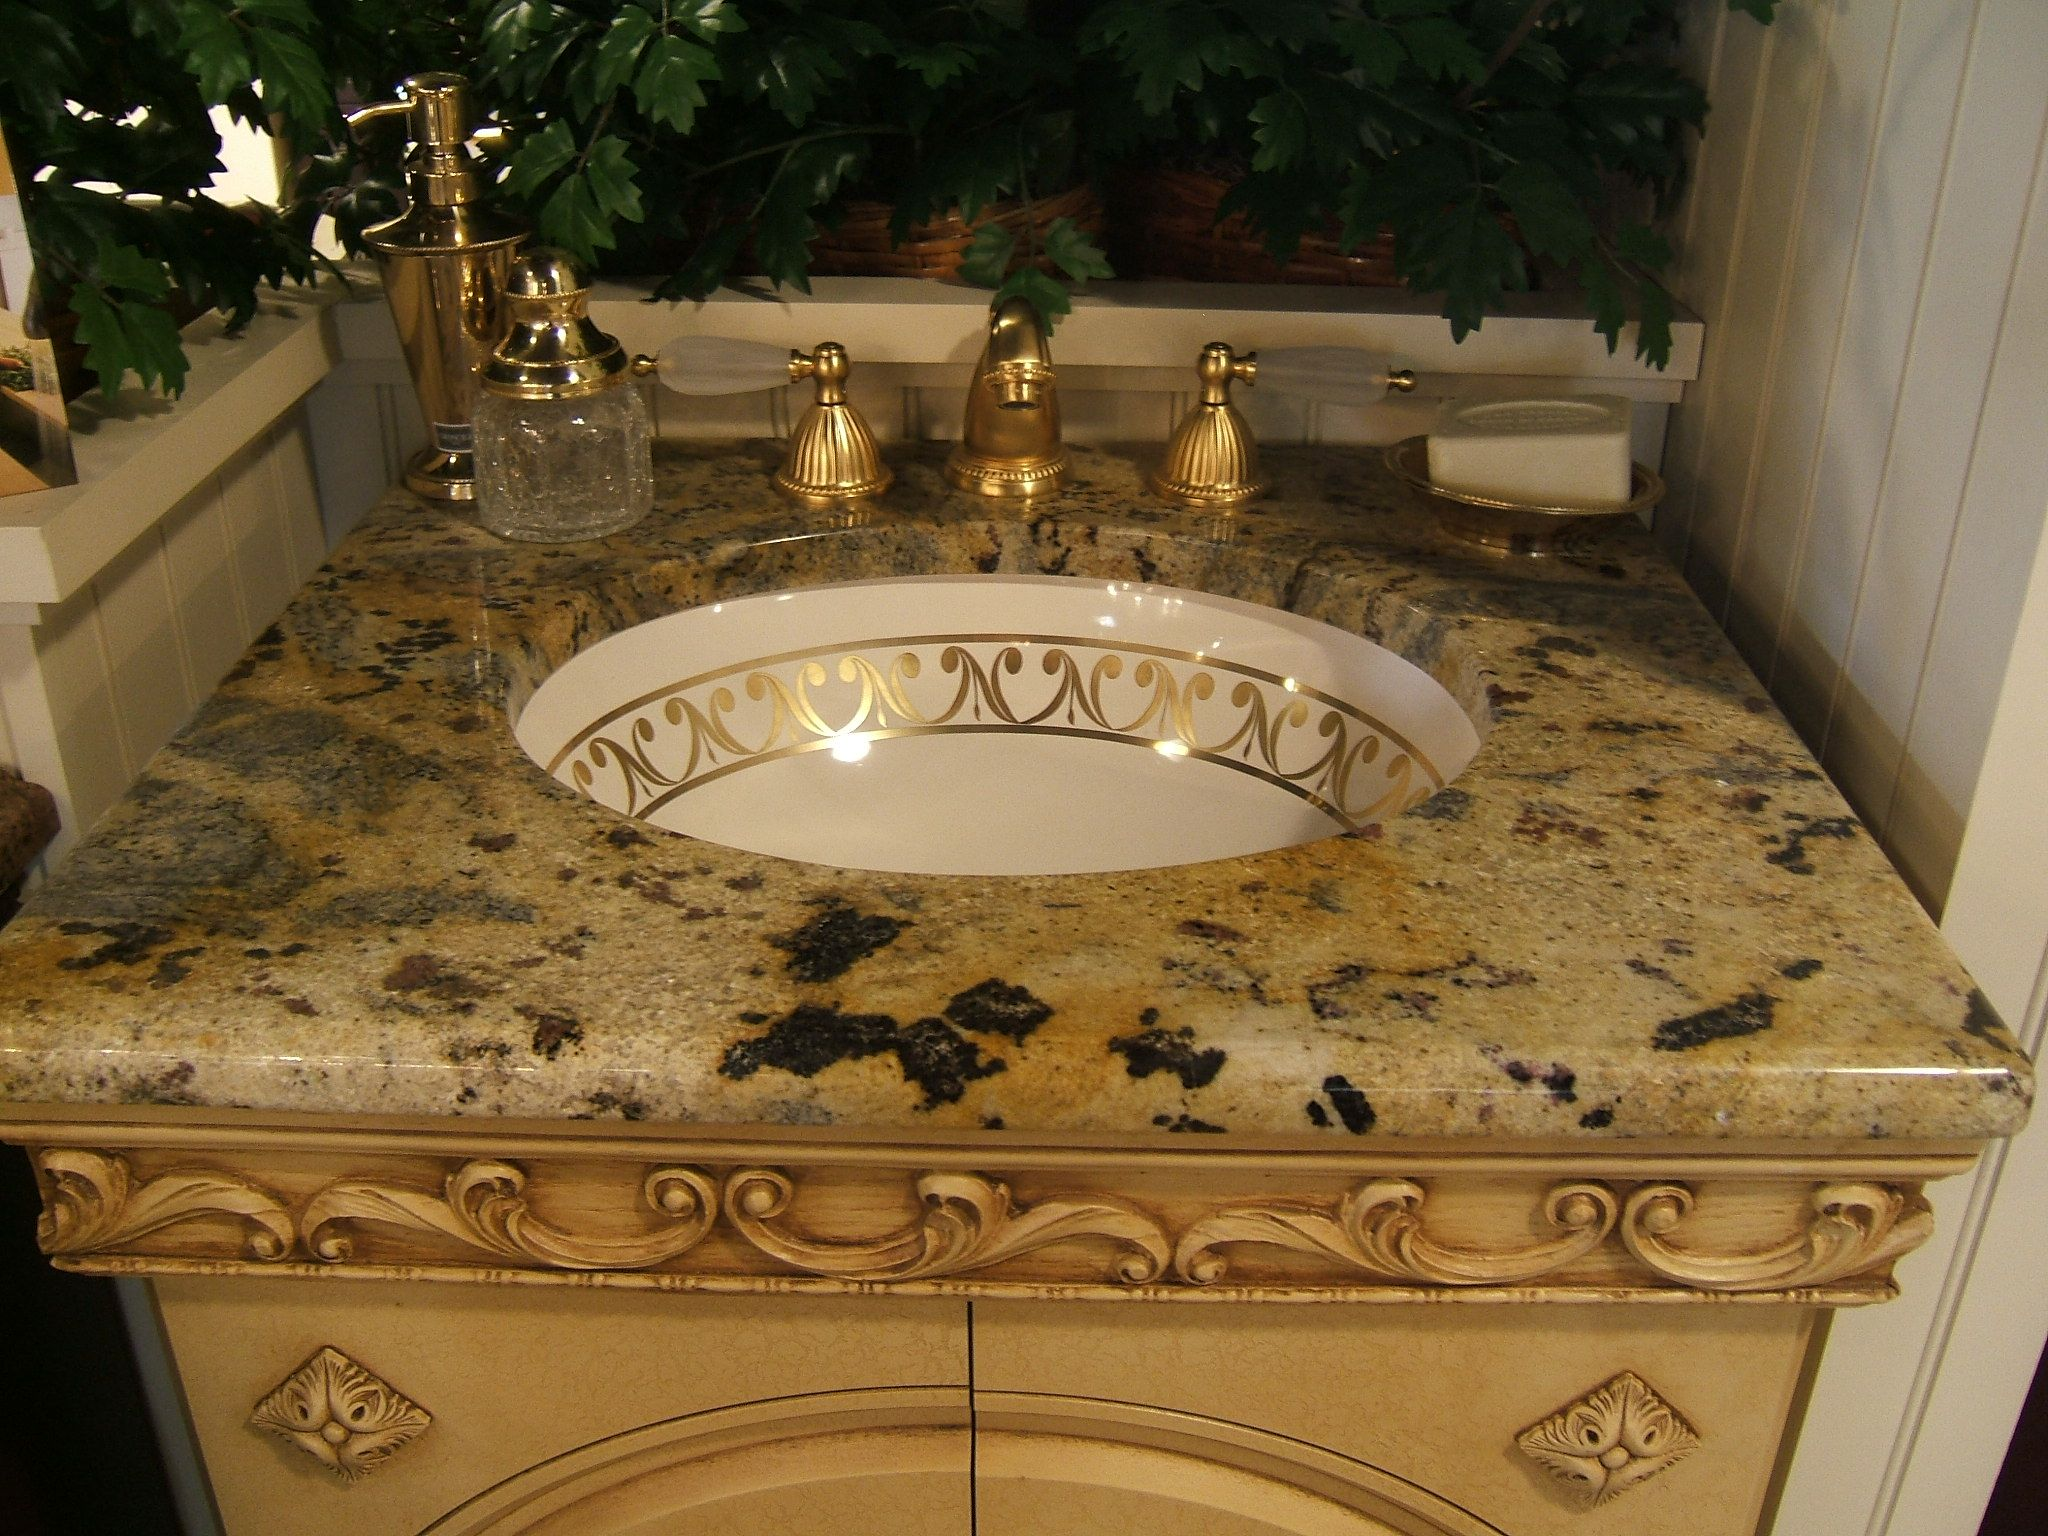 Unique Tan/ Black Granite Bathroom Vanity With White And